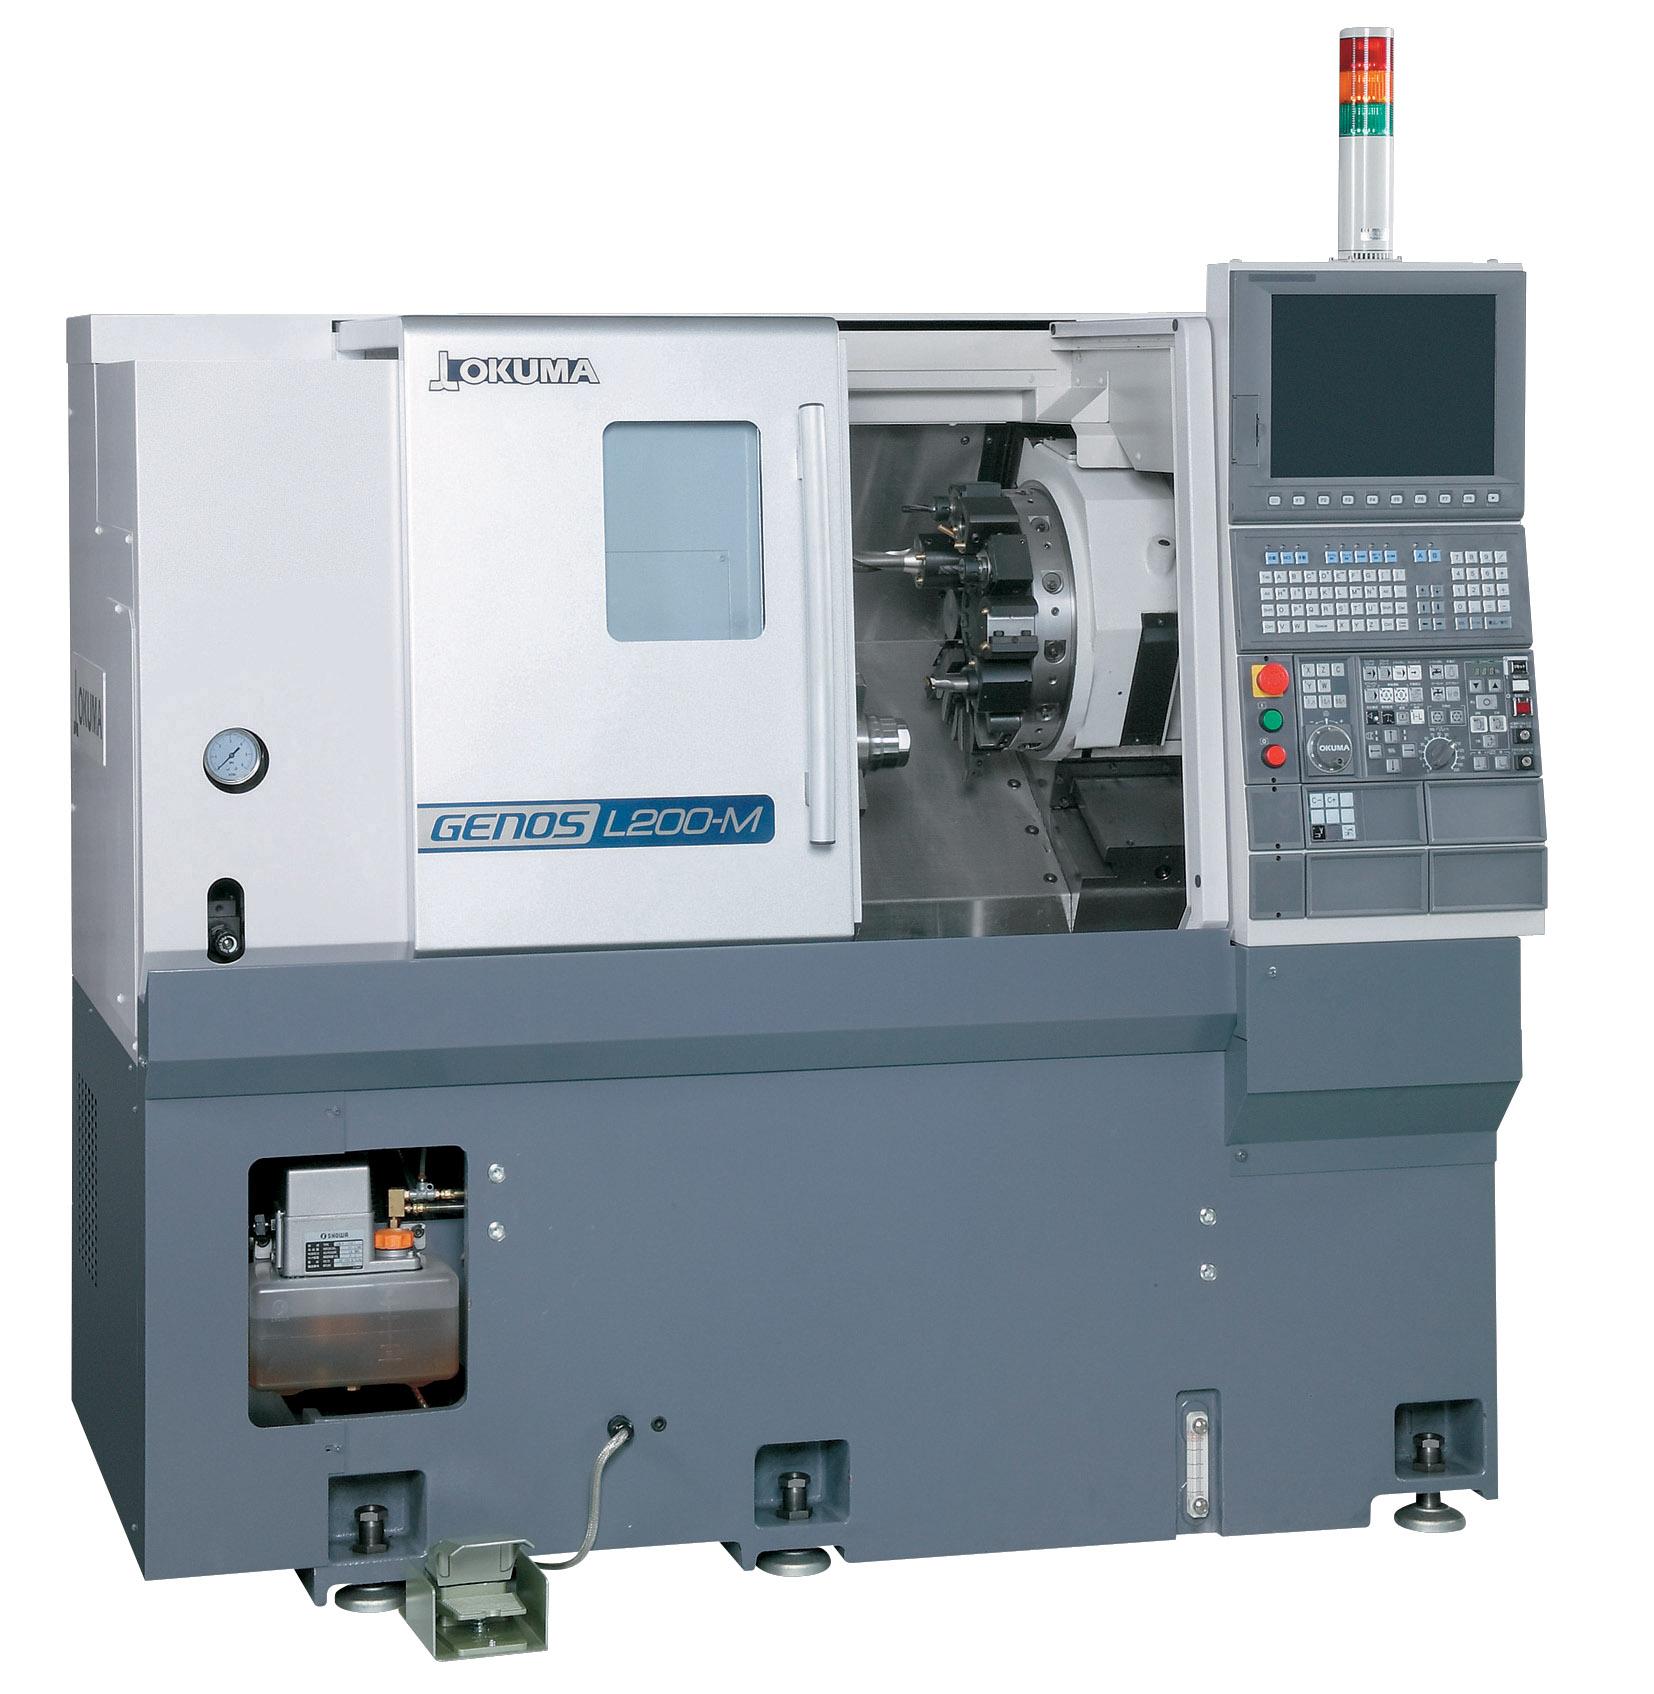 GENOS L200-M